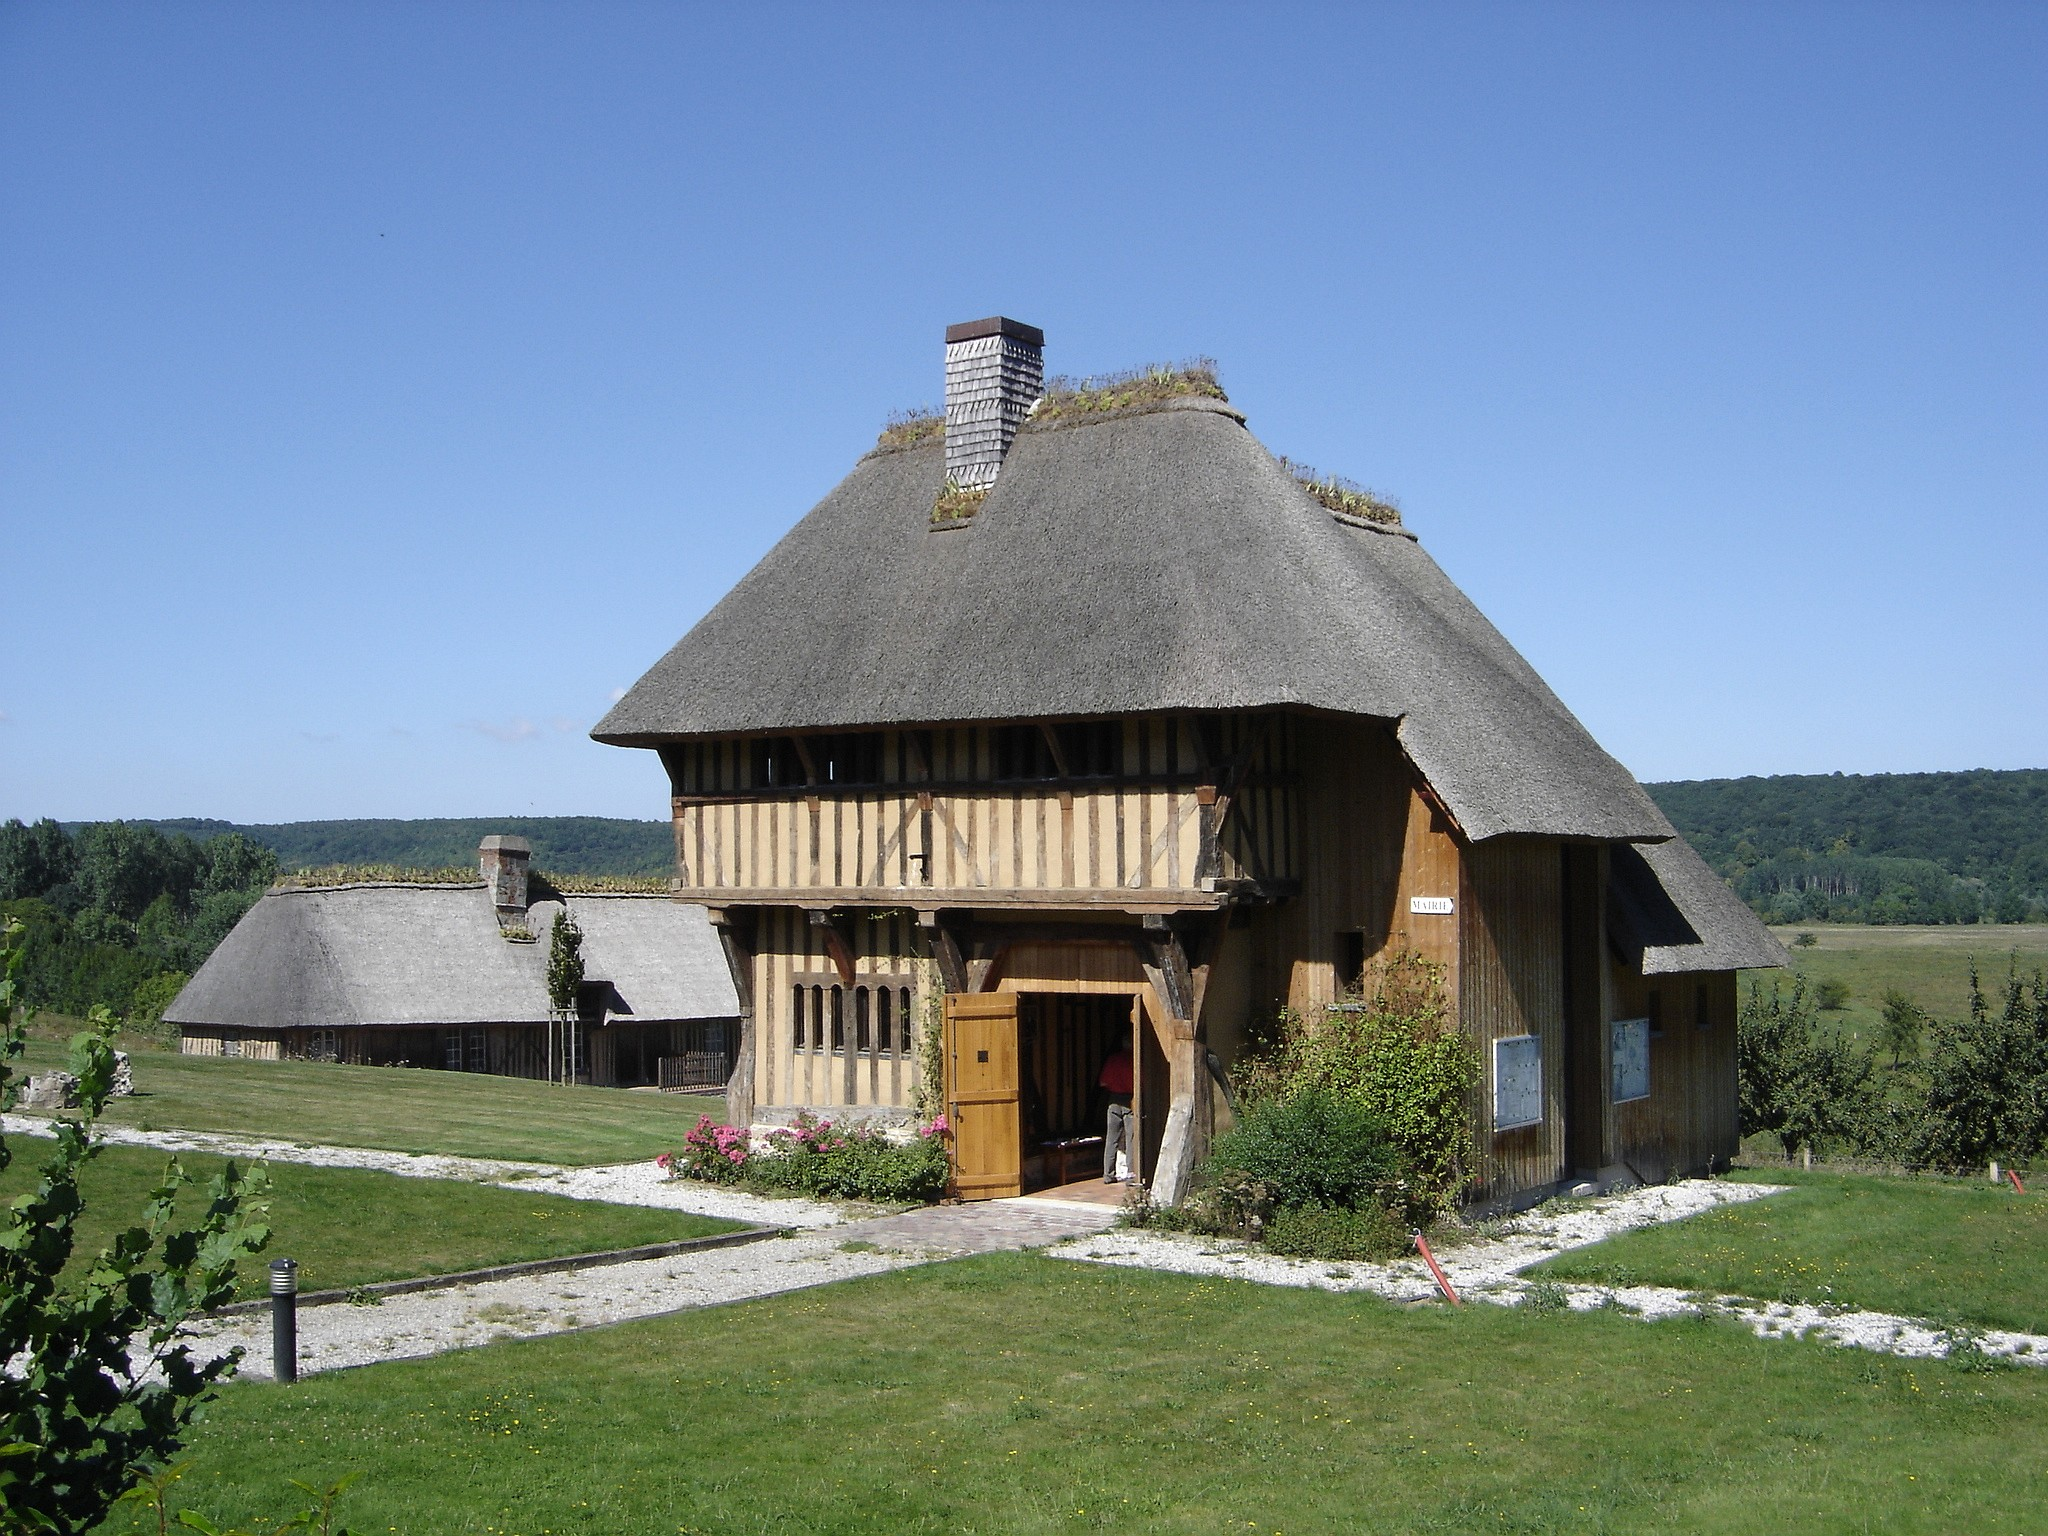 The Home of Inventor Ichabod Payne St_Sulpice_de_Grimbouville